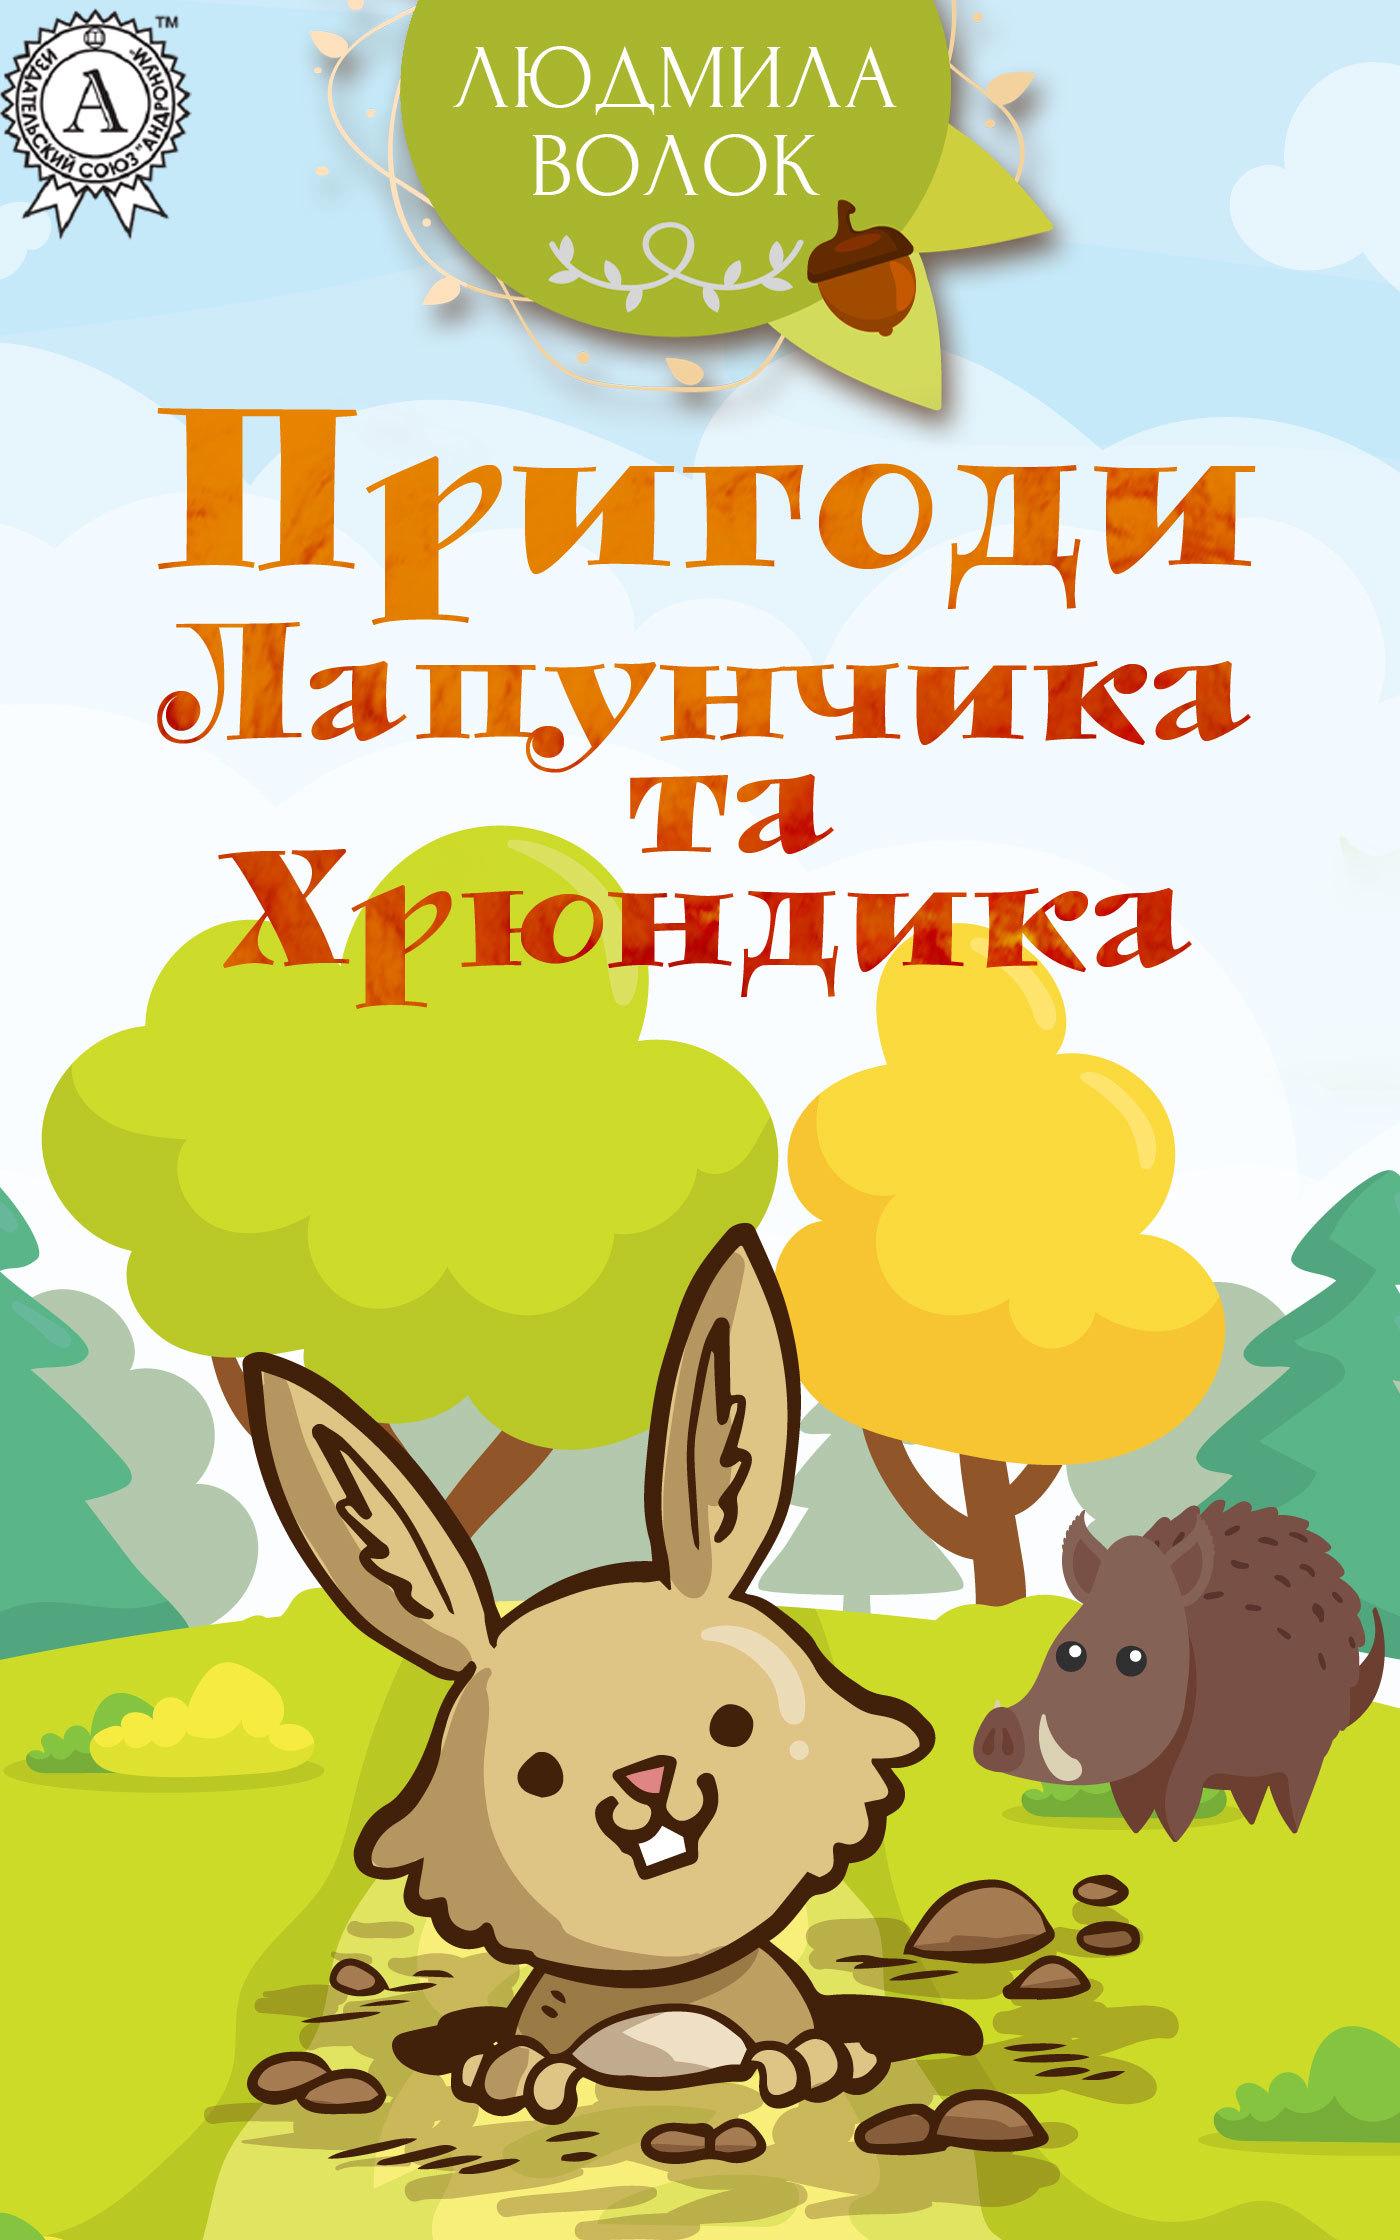 Обложка книги Пригоди Лапунчика та Хрюндика, автор Волок, Людмила